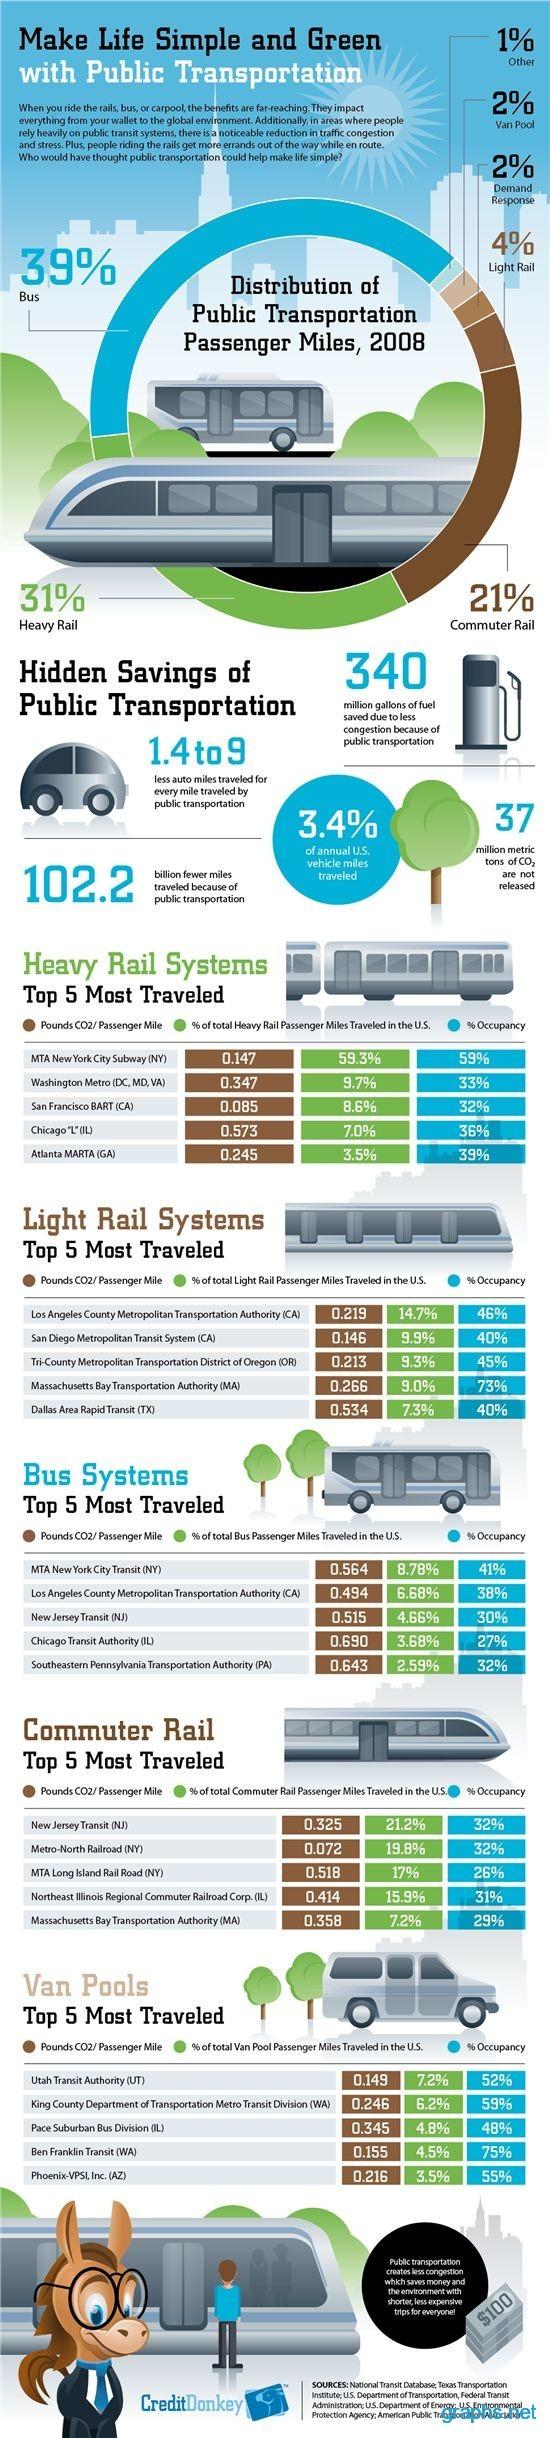 public transportation facts